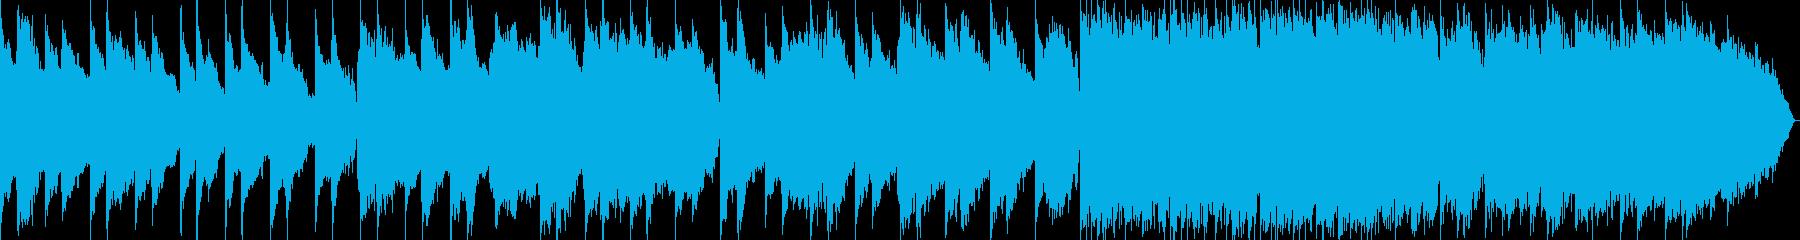 a nice pop trackの再生済みの波形